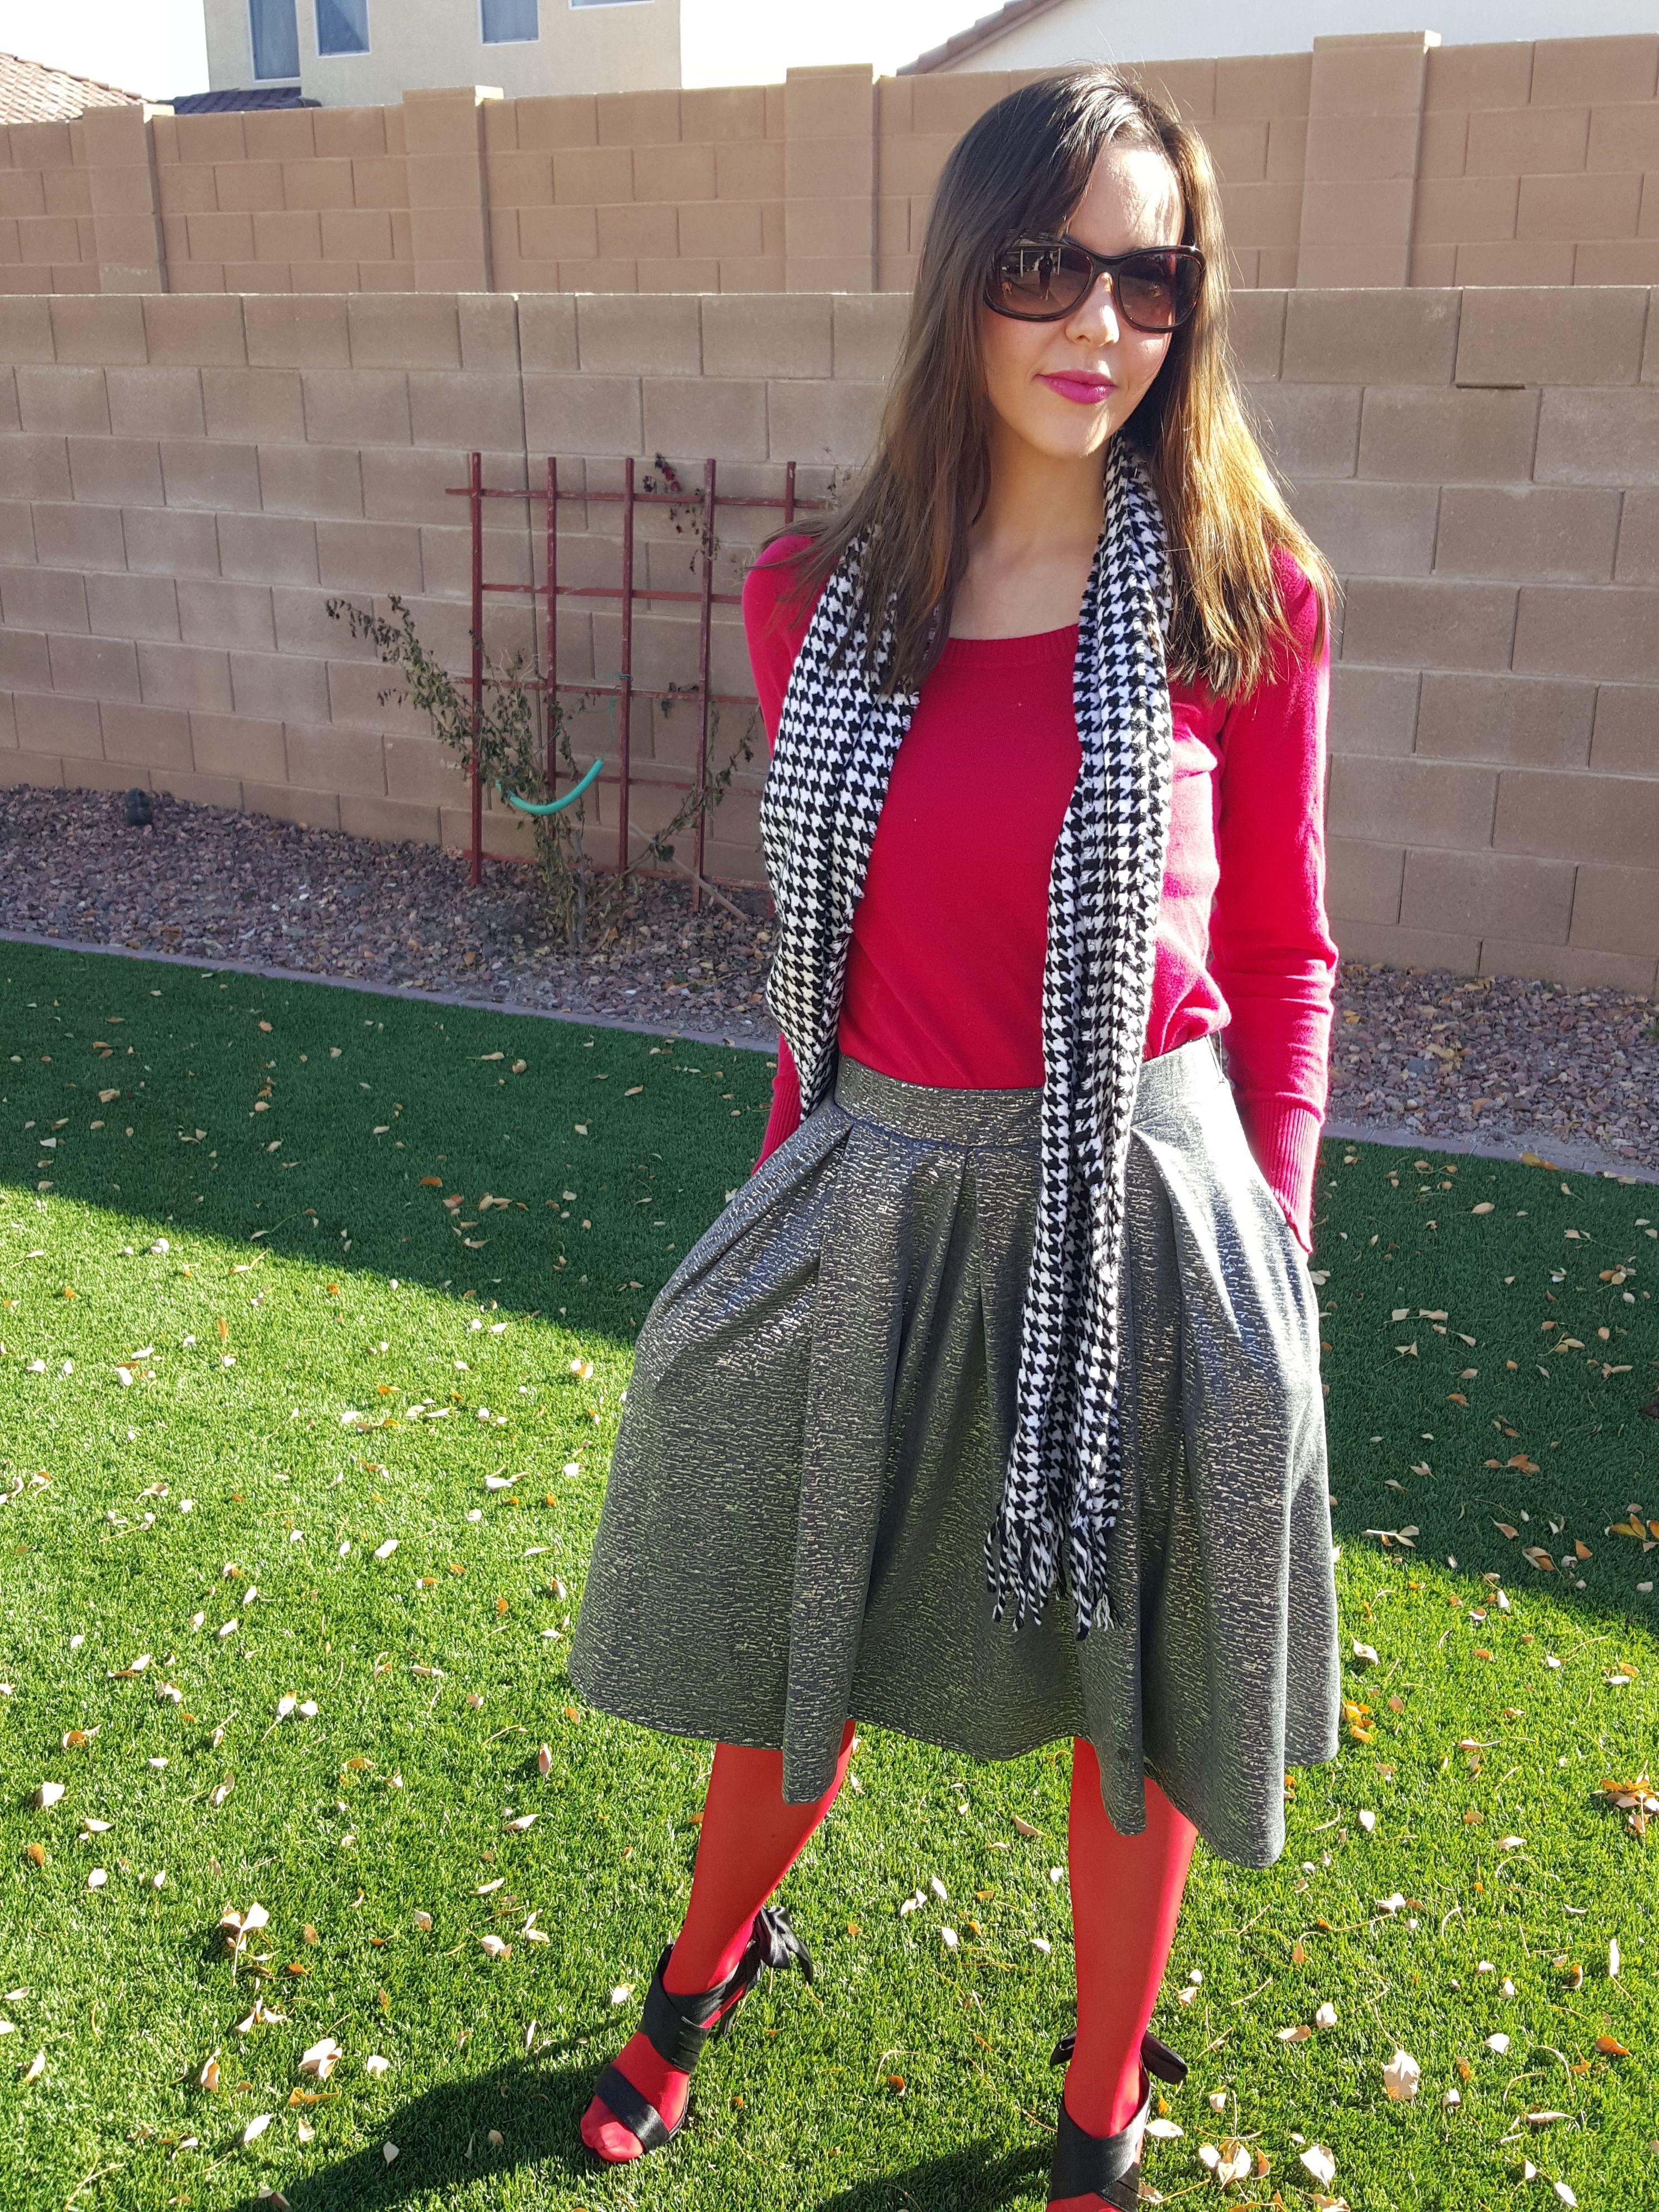 Flannel shirt and leggings  Holiday LuLaRoe Madison skirt tunic sweater Victoria Secret red